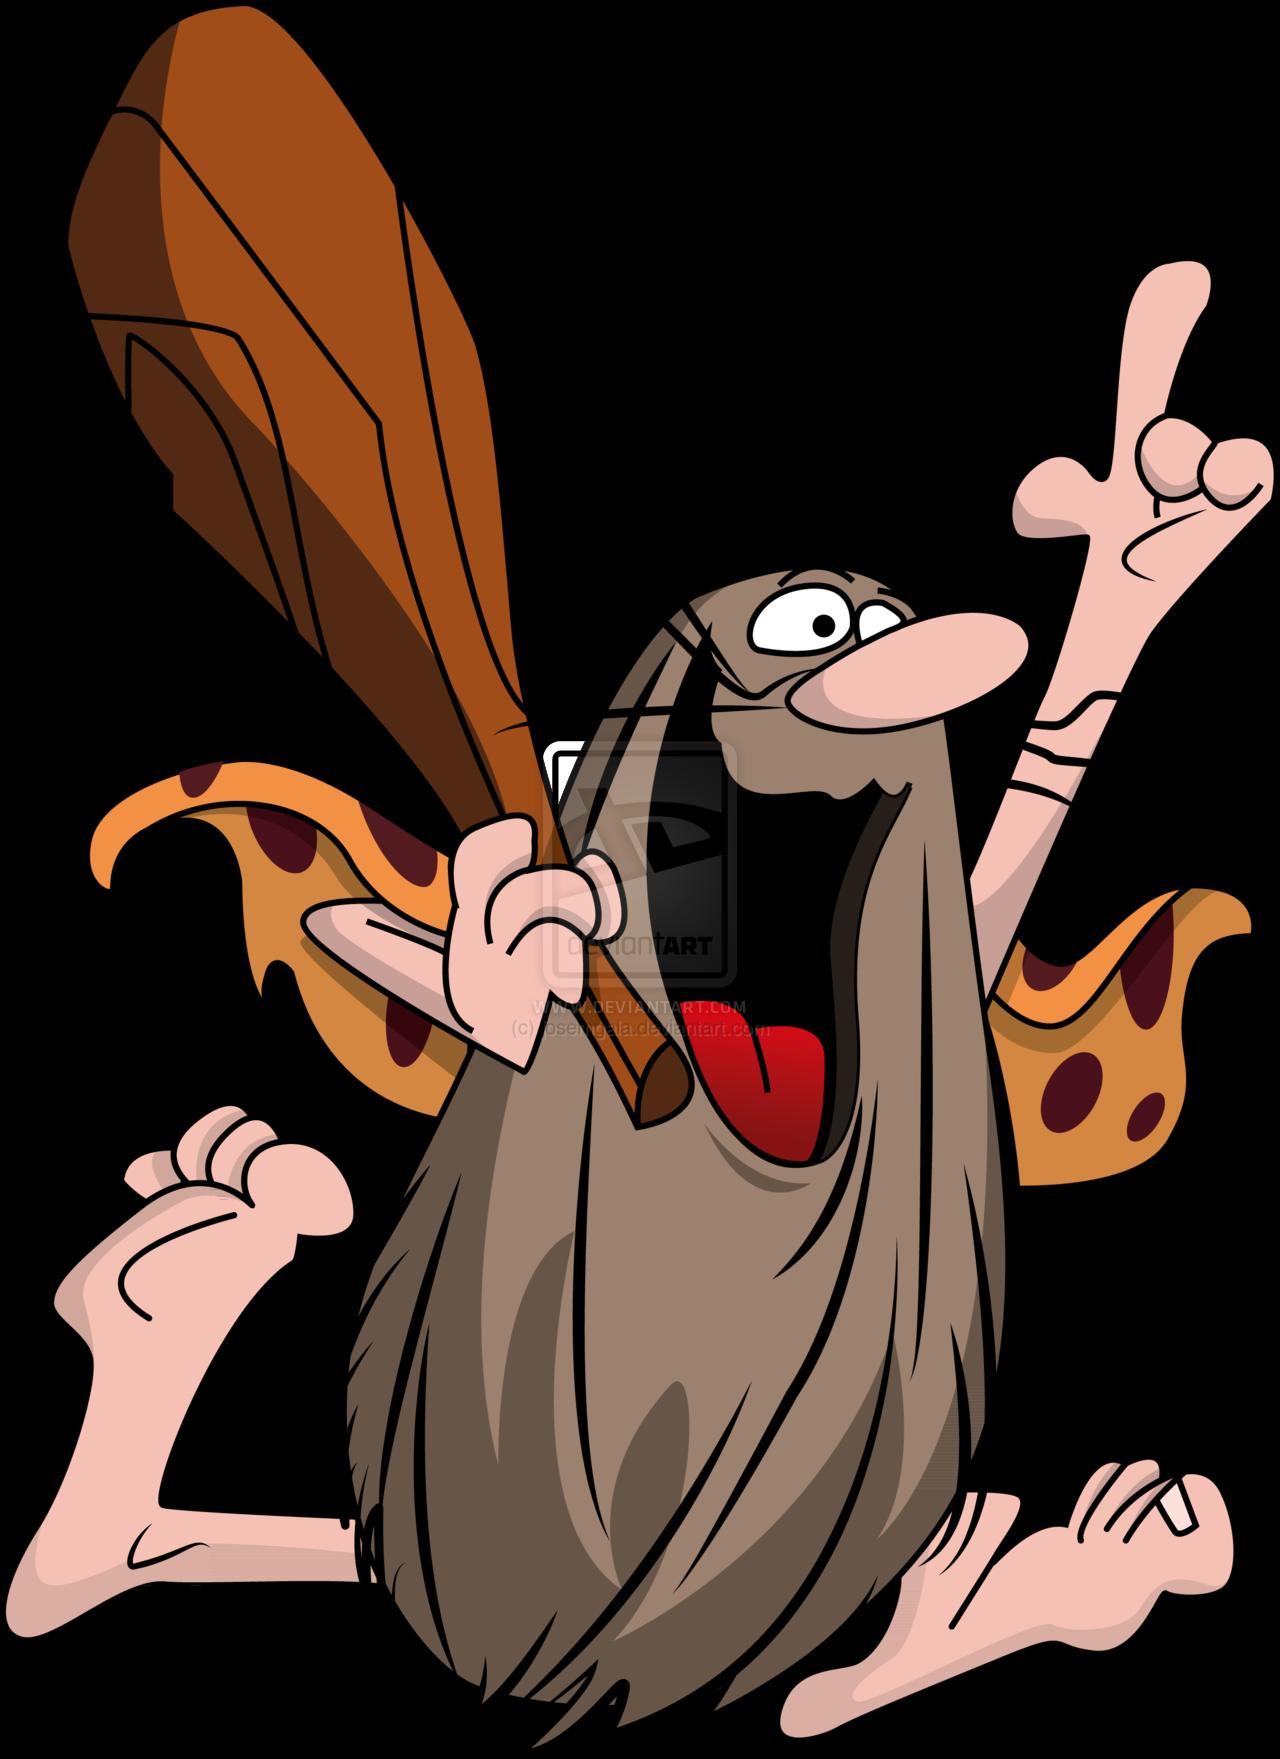 Hunting clipart caveman. Unga bunga captain could